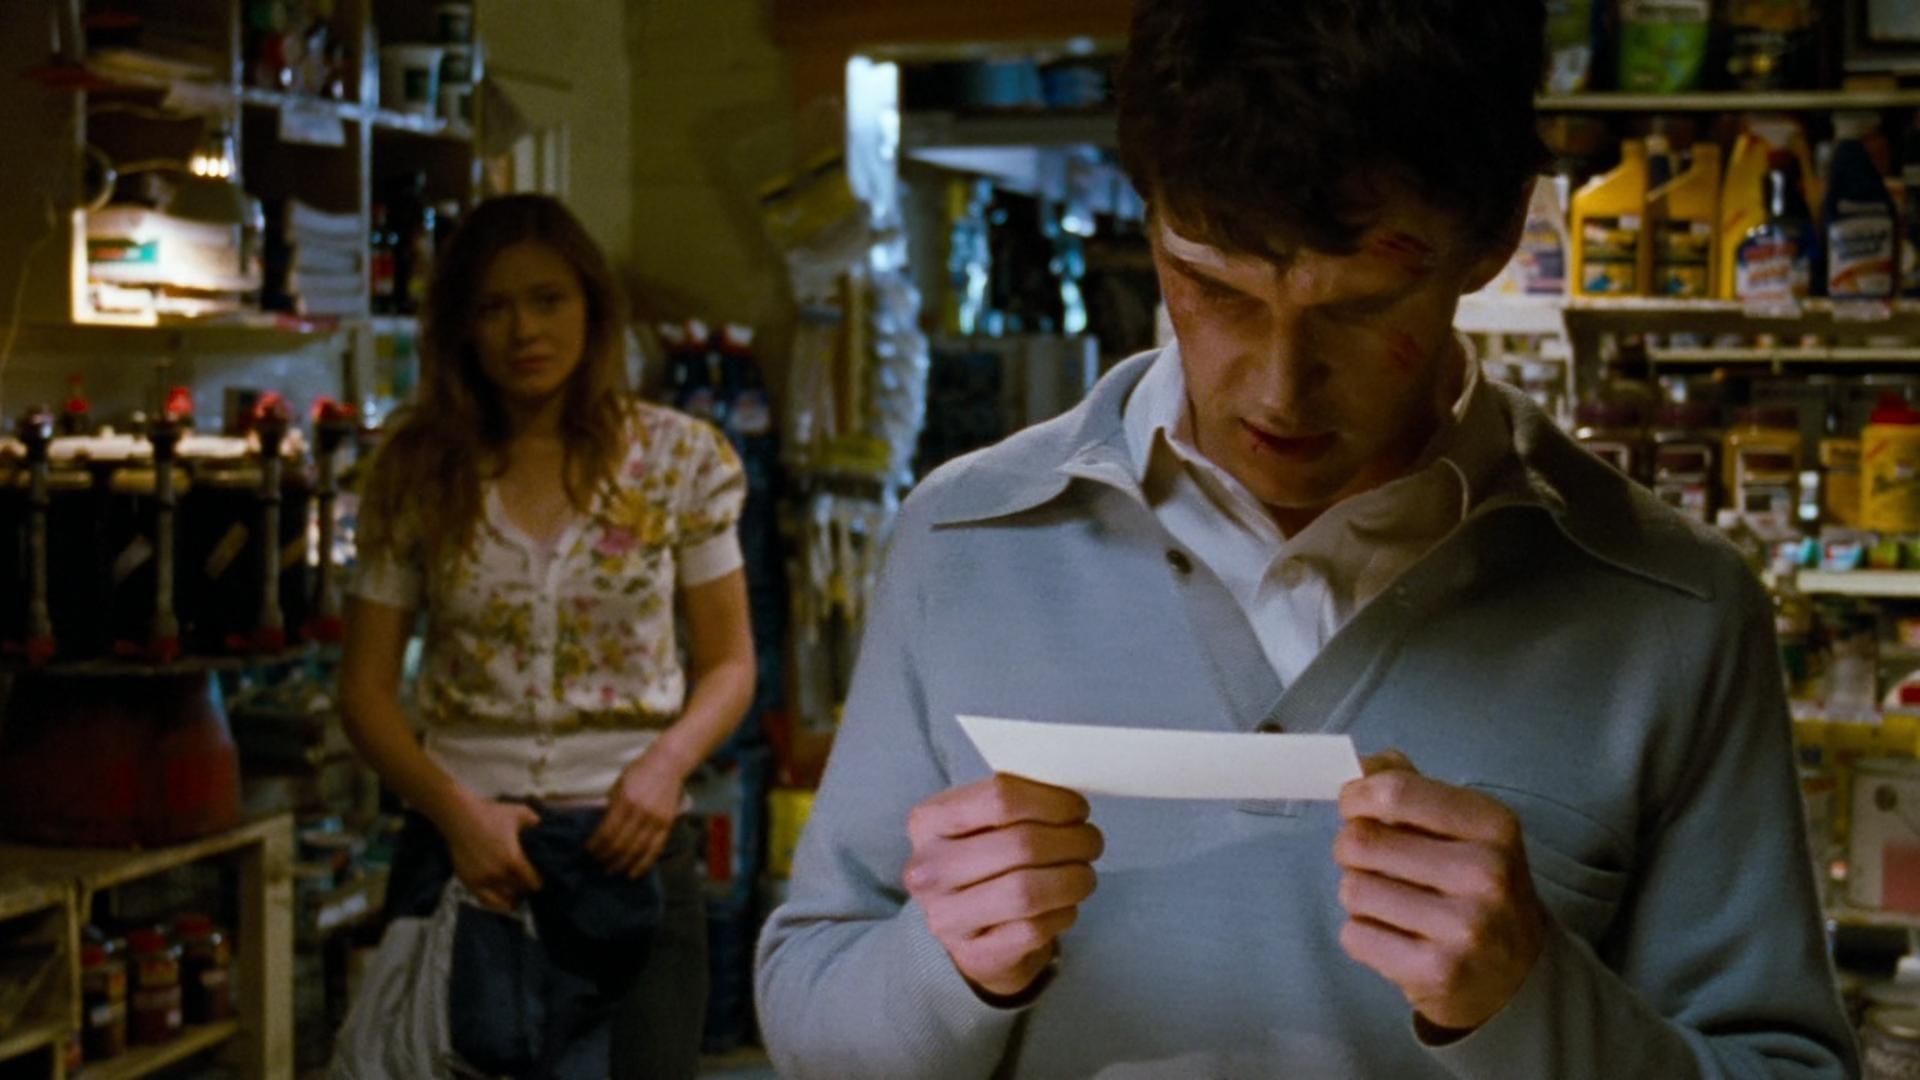 film griff the invisible imdb